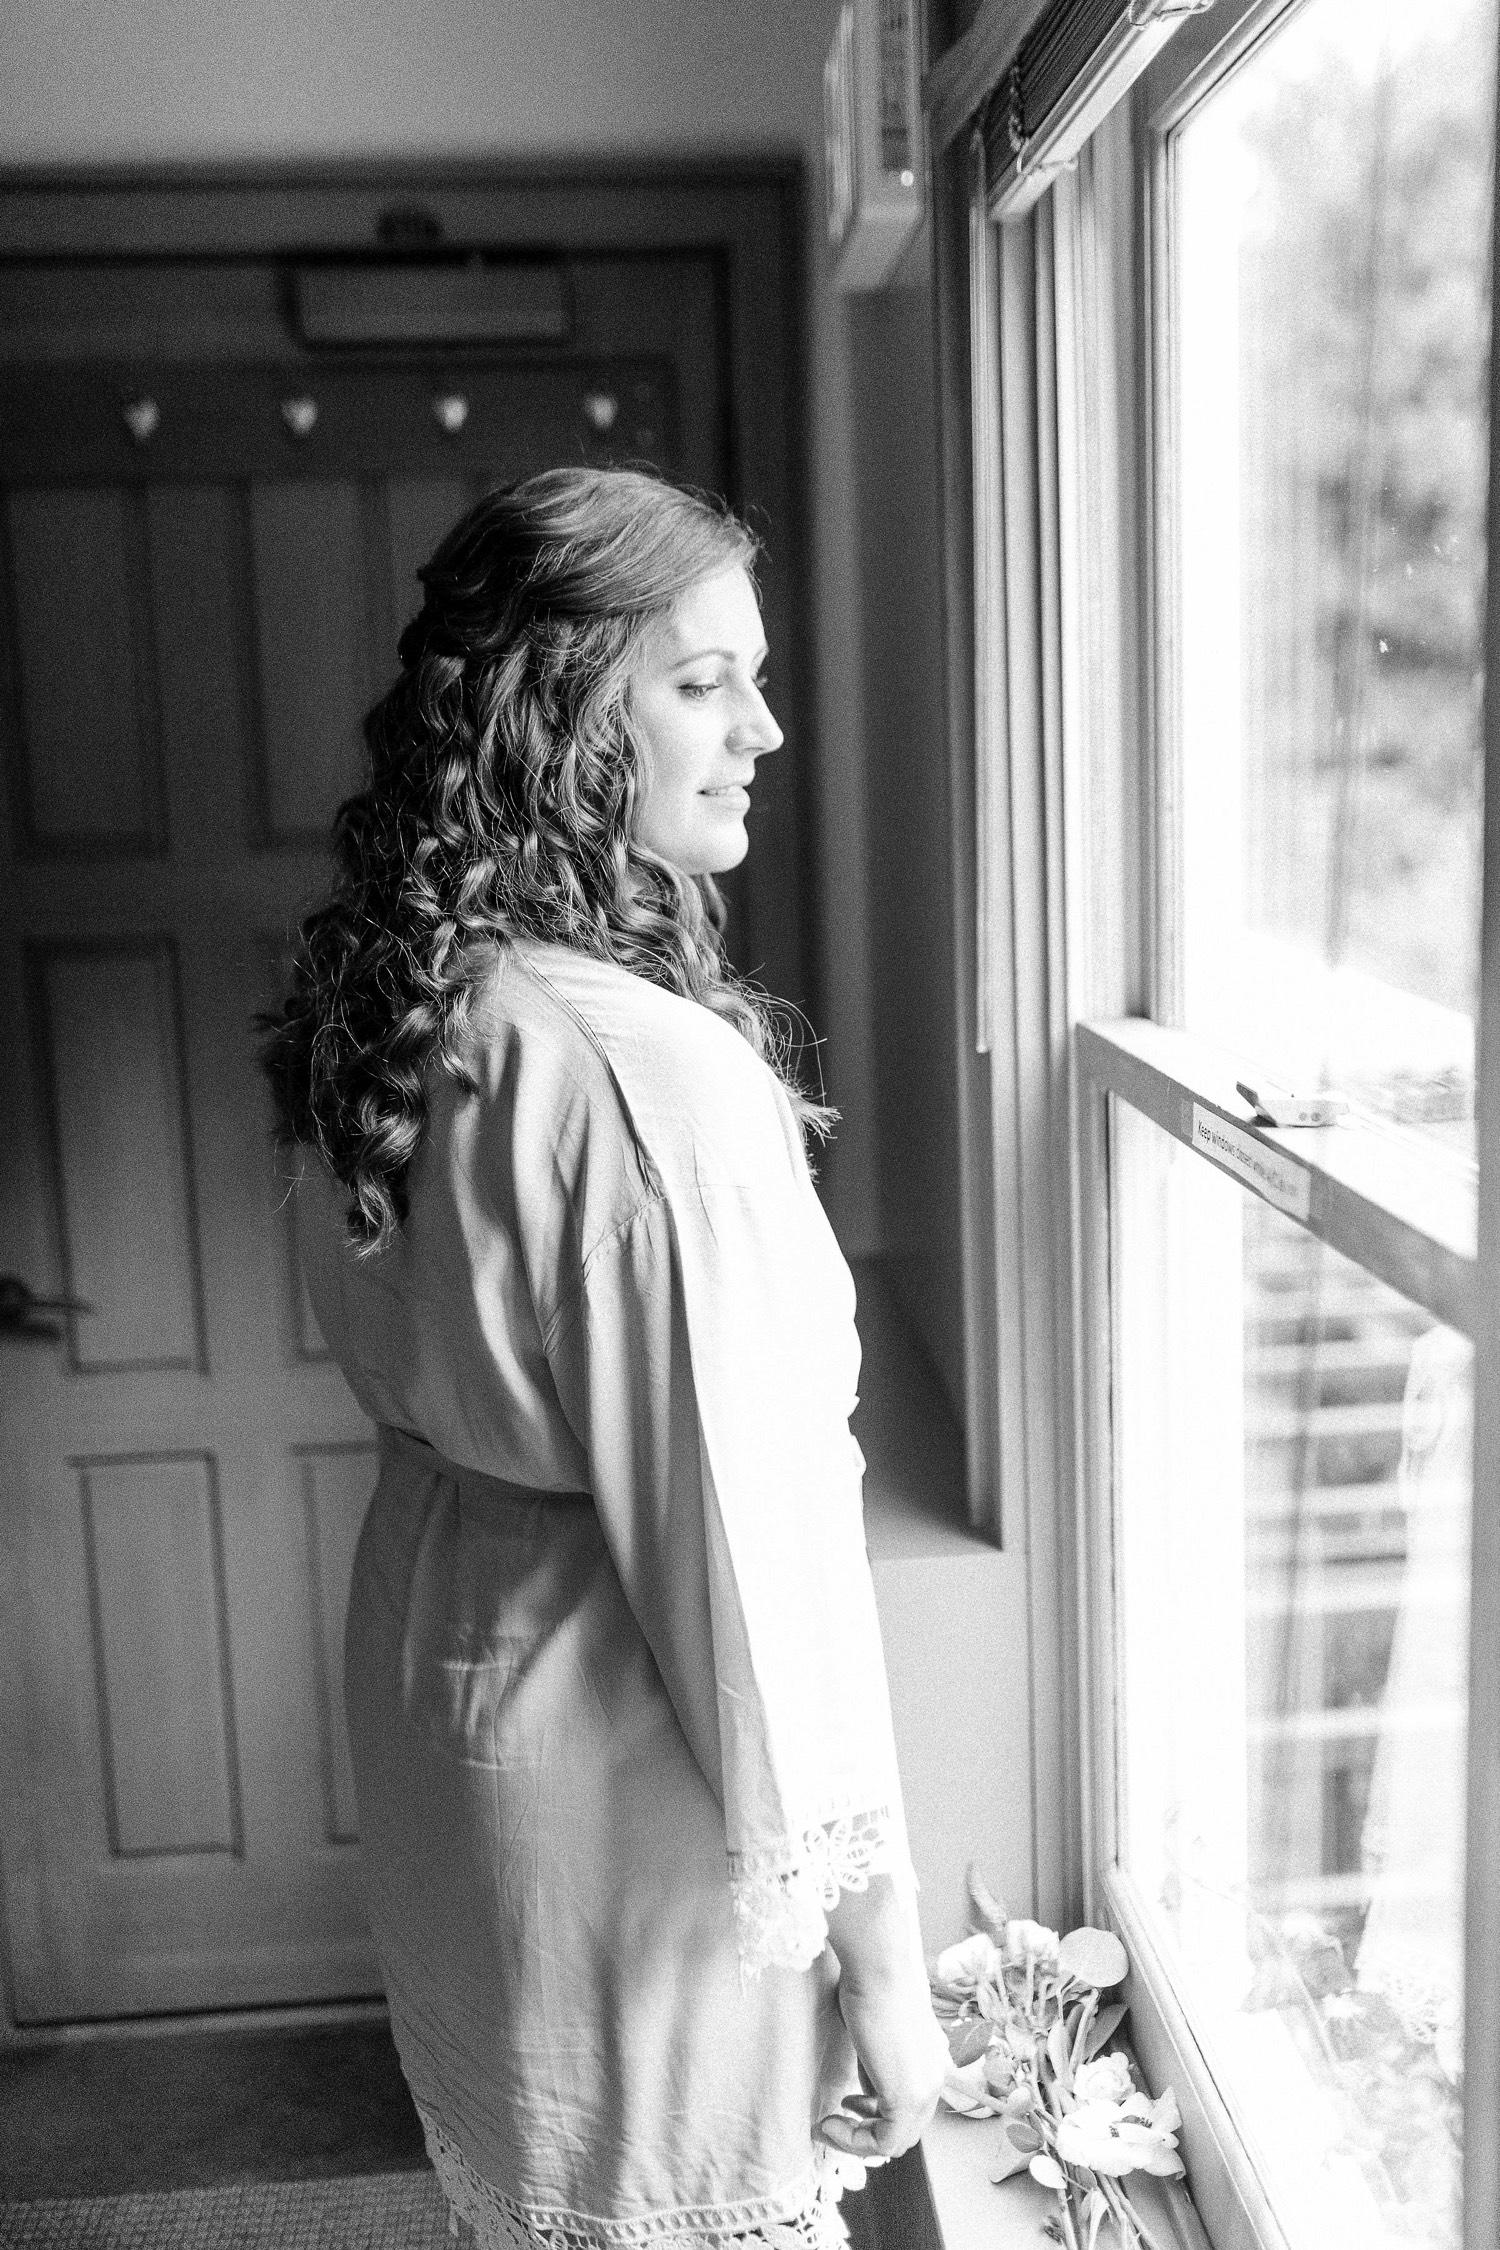 0000000000006_emmarosecompany_katiematt-2784_Photographer_PNW_House_Robinswood_Emma_Light_Company_Airy_Rose_and_Wedding_Seattle.jpg